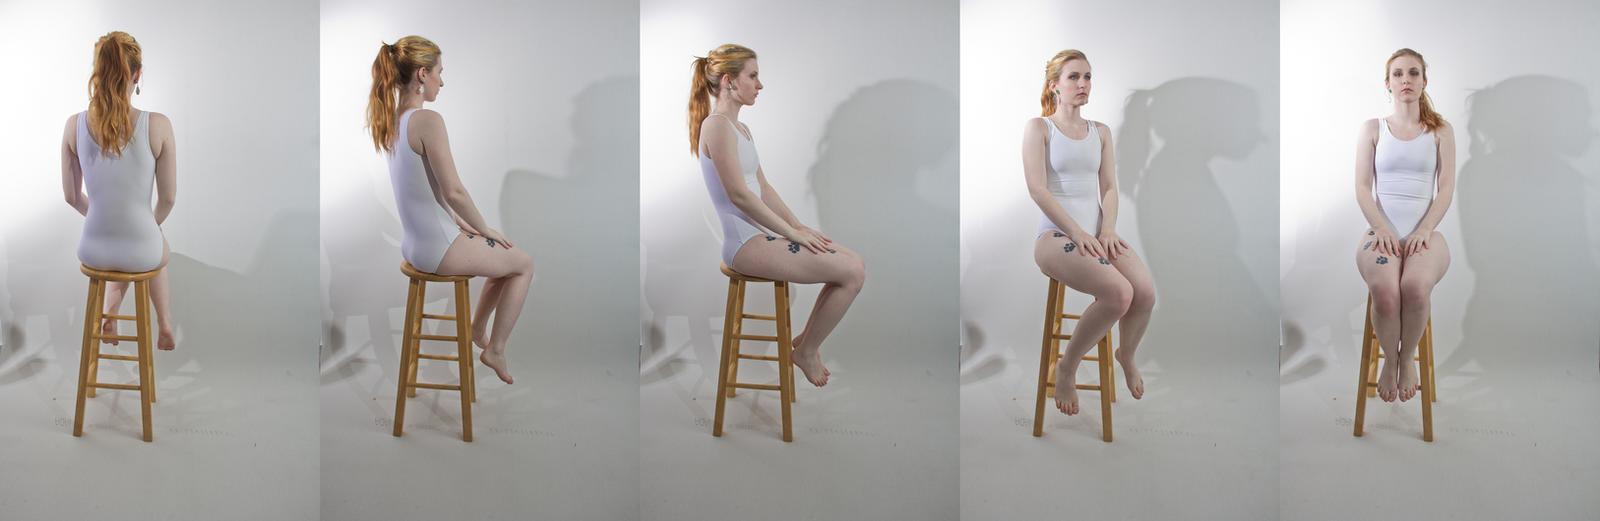 Pose ref: sitting turnaround by Sinned-angel-stock